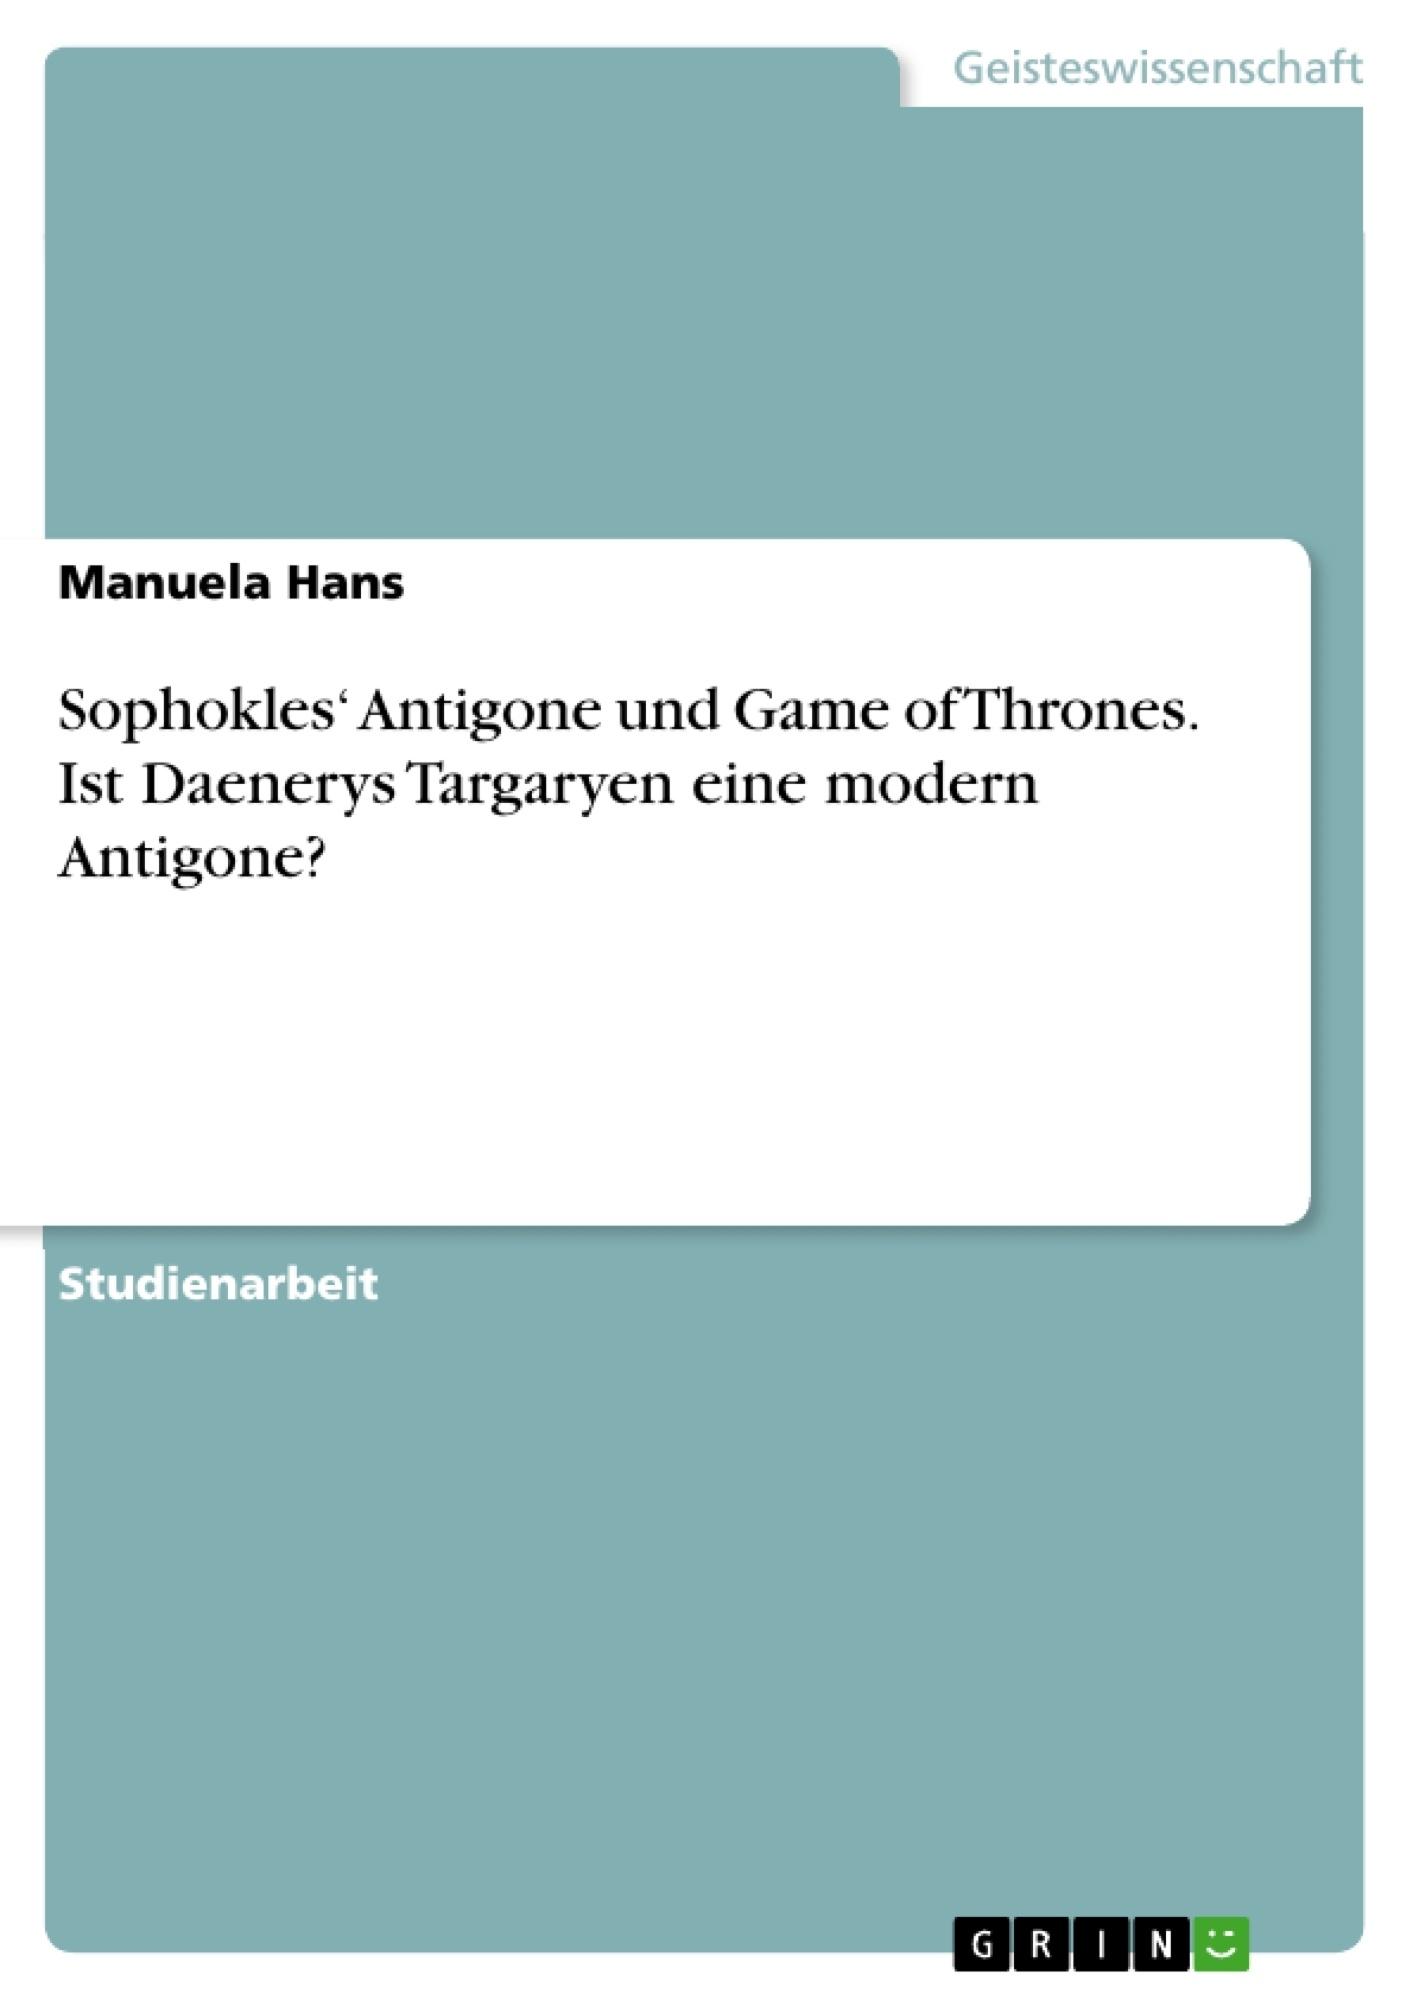 Titel: Sophokles' Antigone und Game of Thrones. Ist Daenerys Targaryen eine modern Antigone?